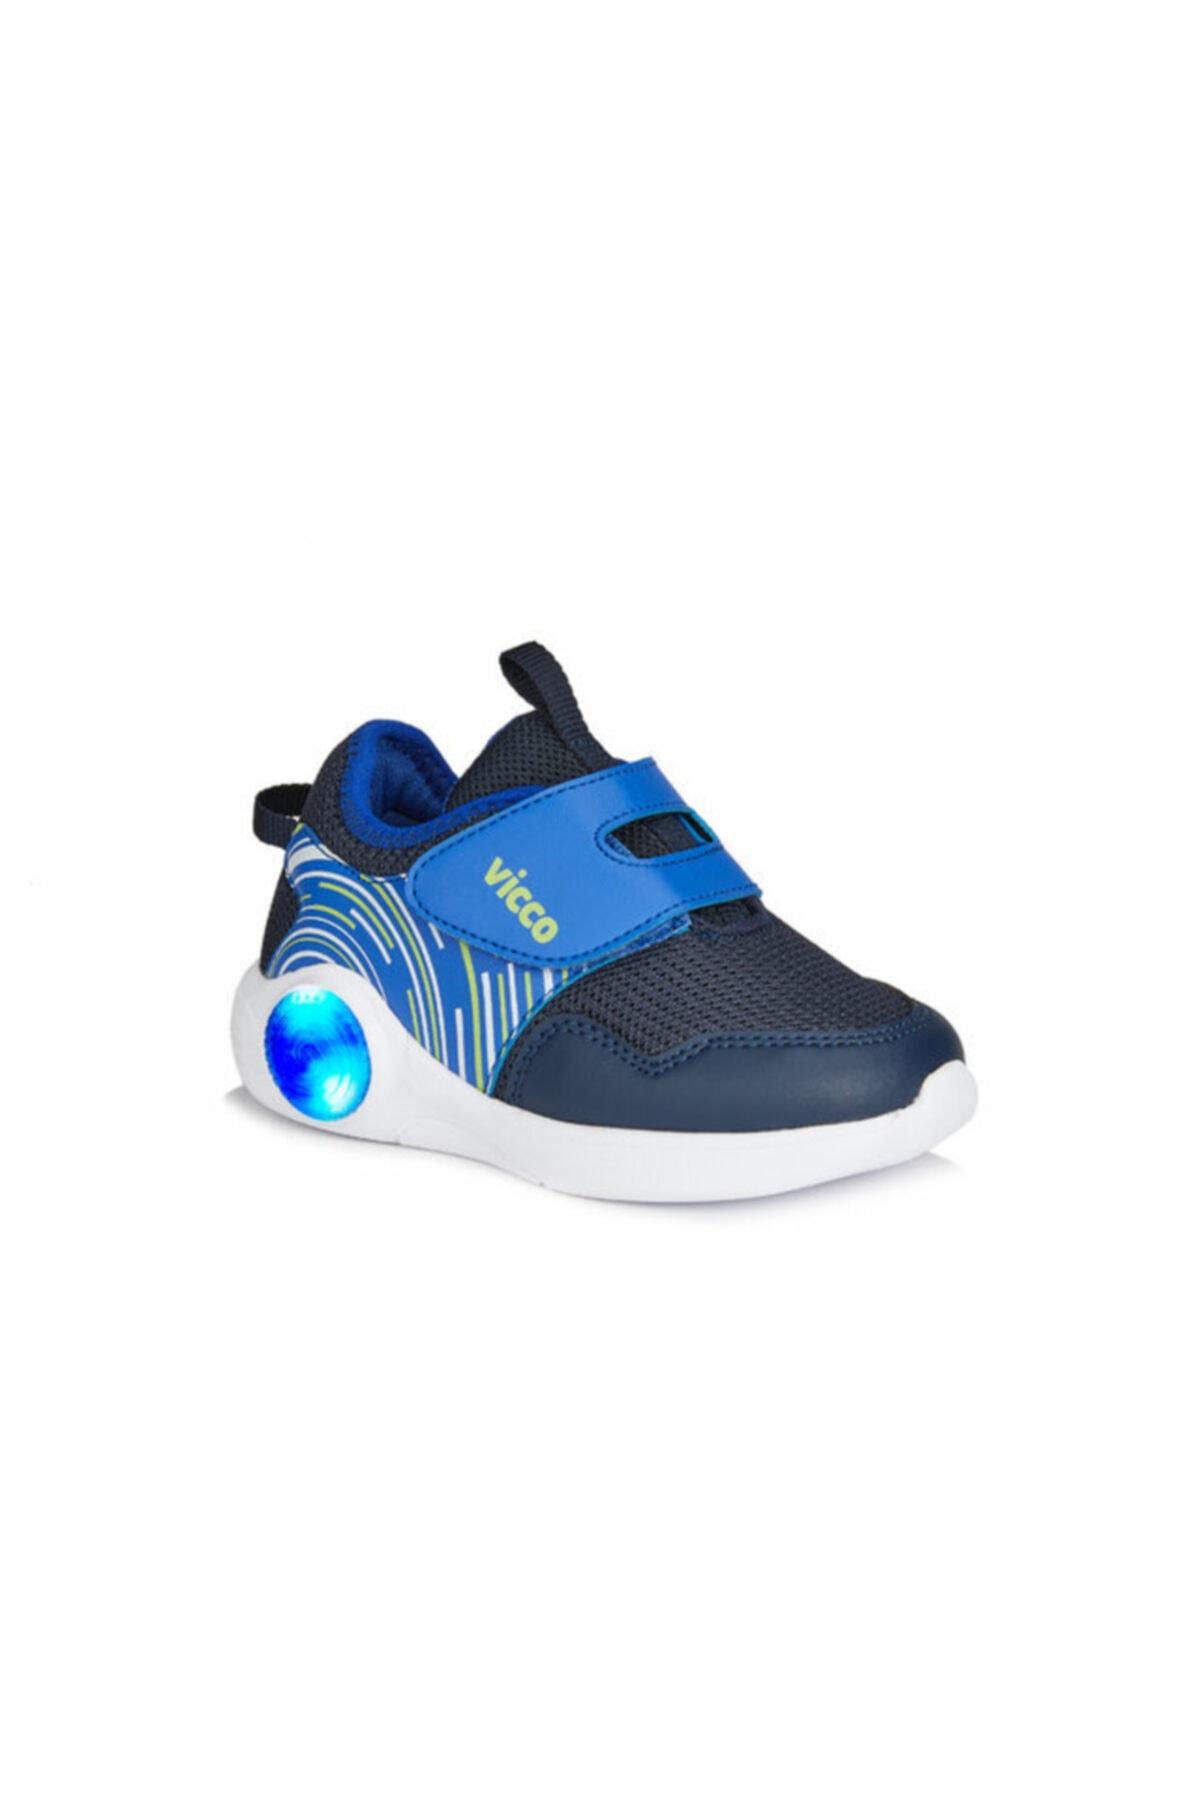 Vicco Jojo Lacivert Spor Ayakkabı (346.b20y.213-01) 1